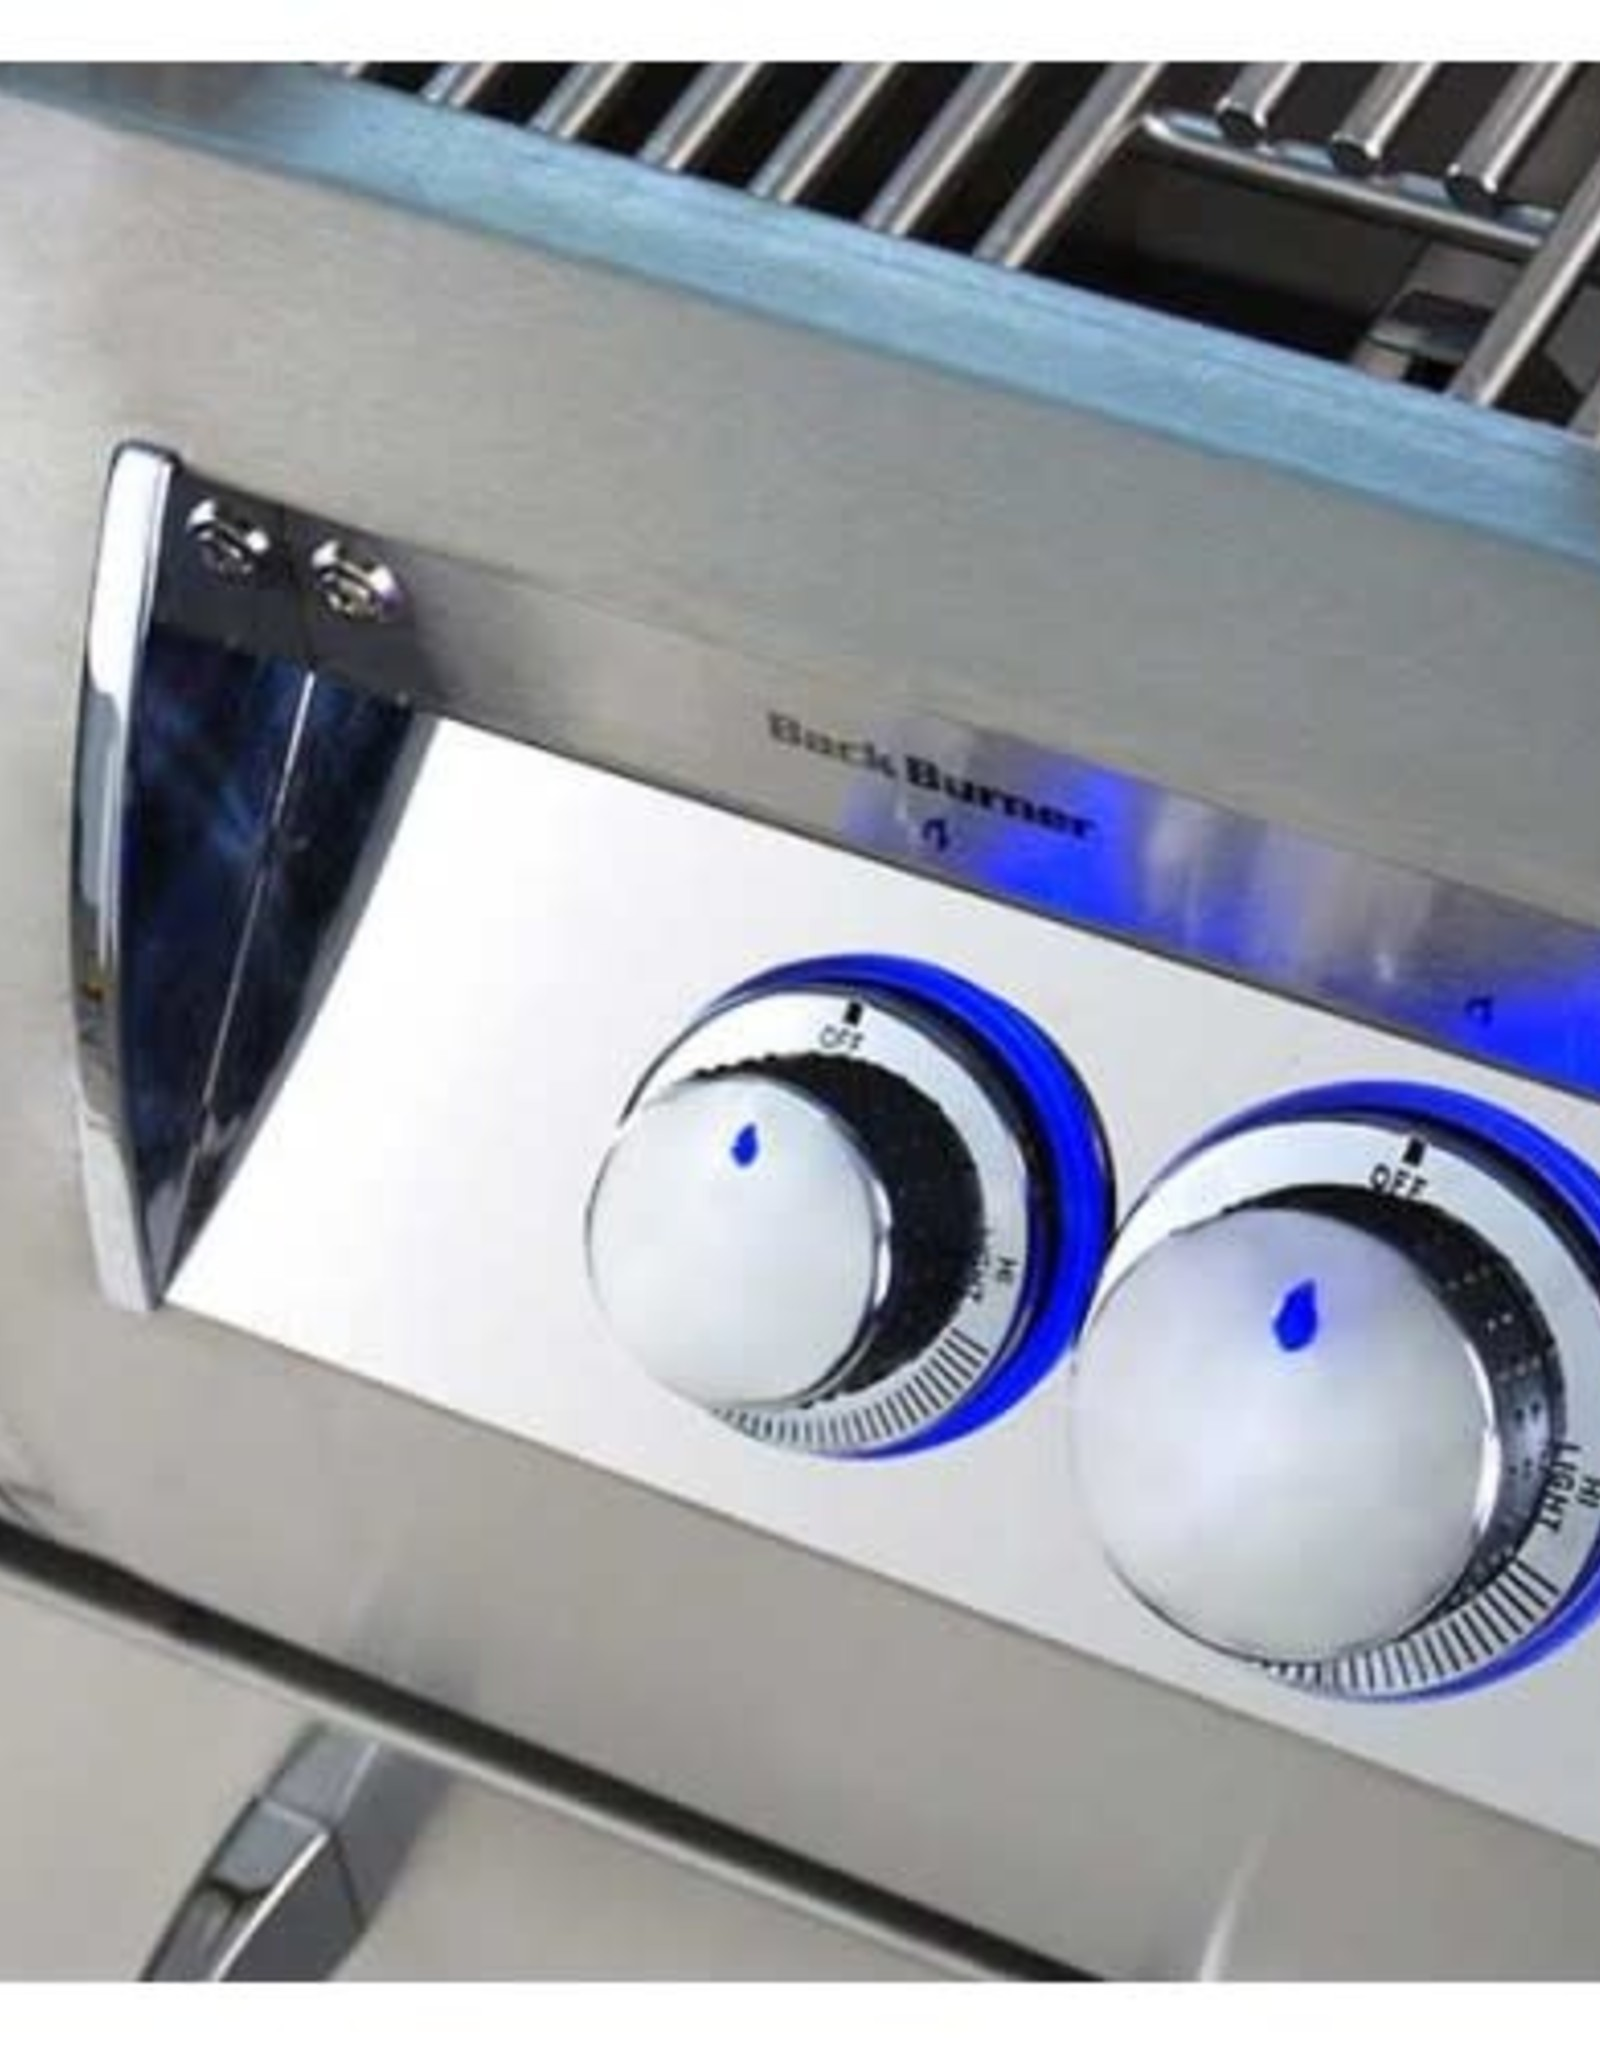 Fire Magic Fire Magic - Aurora A430i 24-inch Built-In Grill With Rotisserie